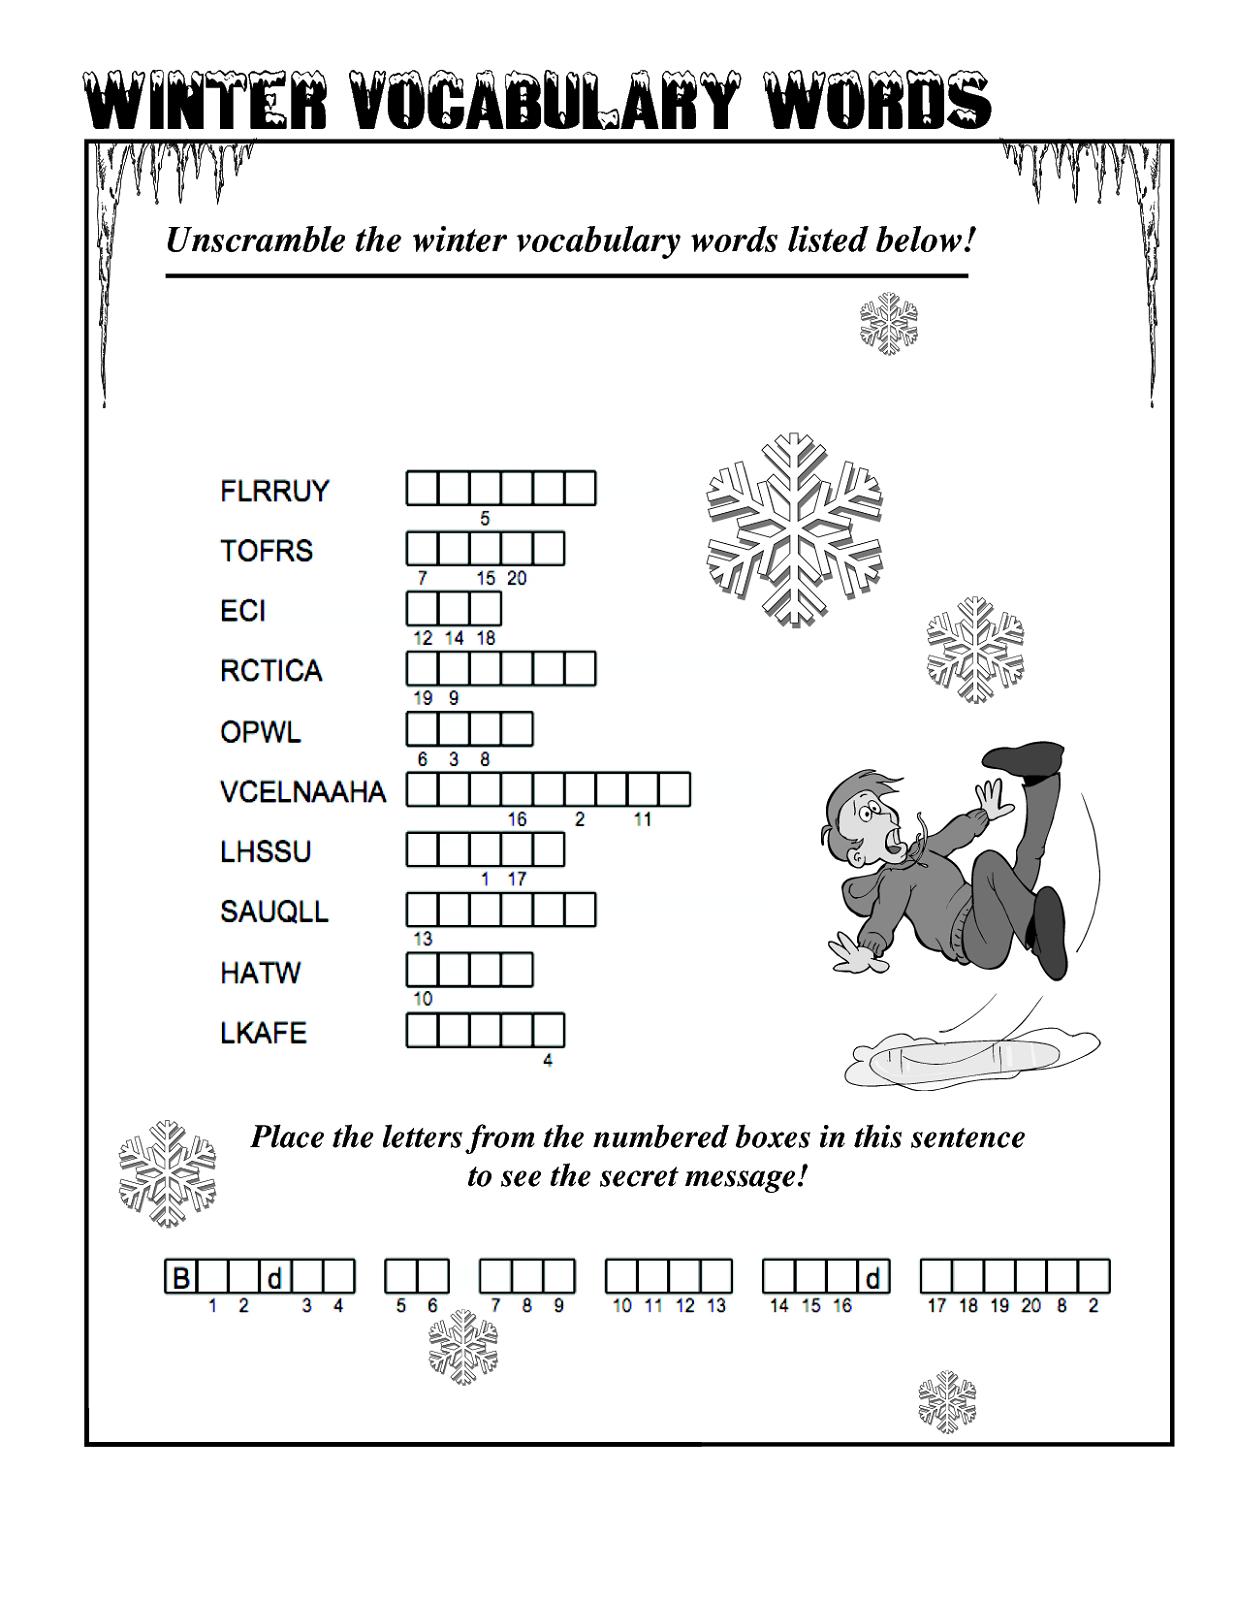 word-scramble-worksheet-winter